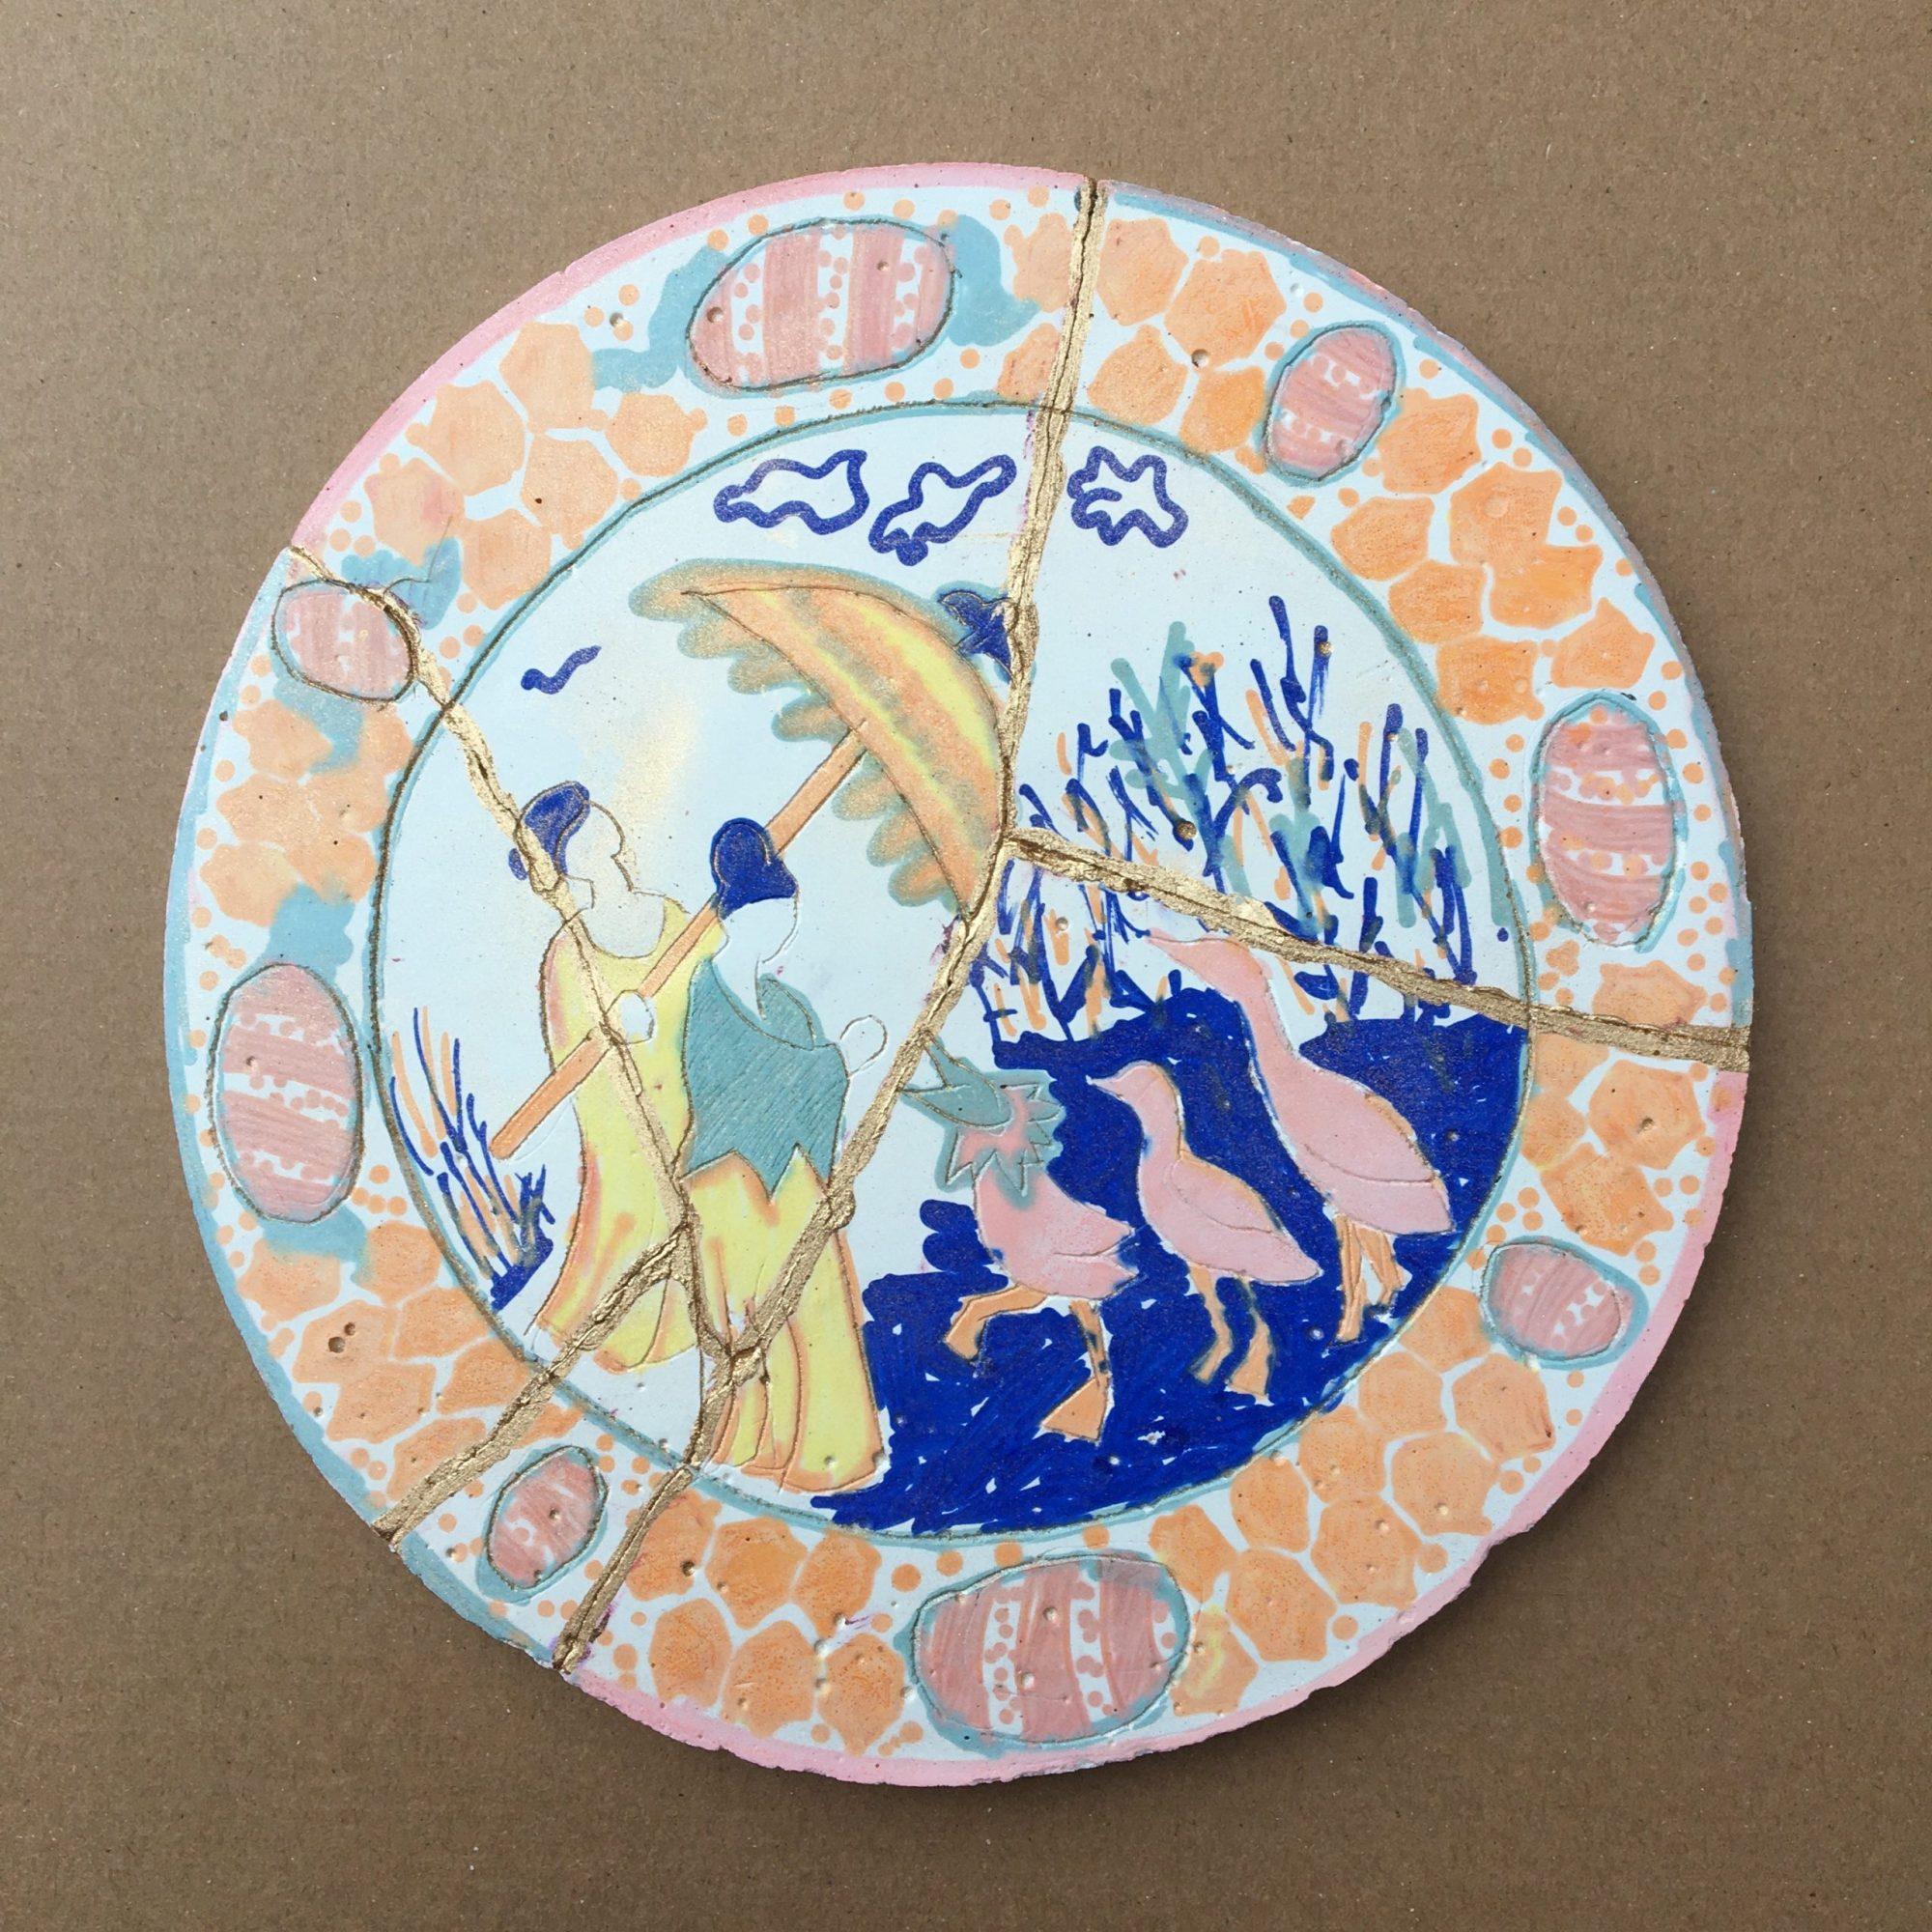 Yasemin's plate (Oxford Hub volunteer)